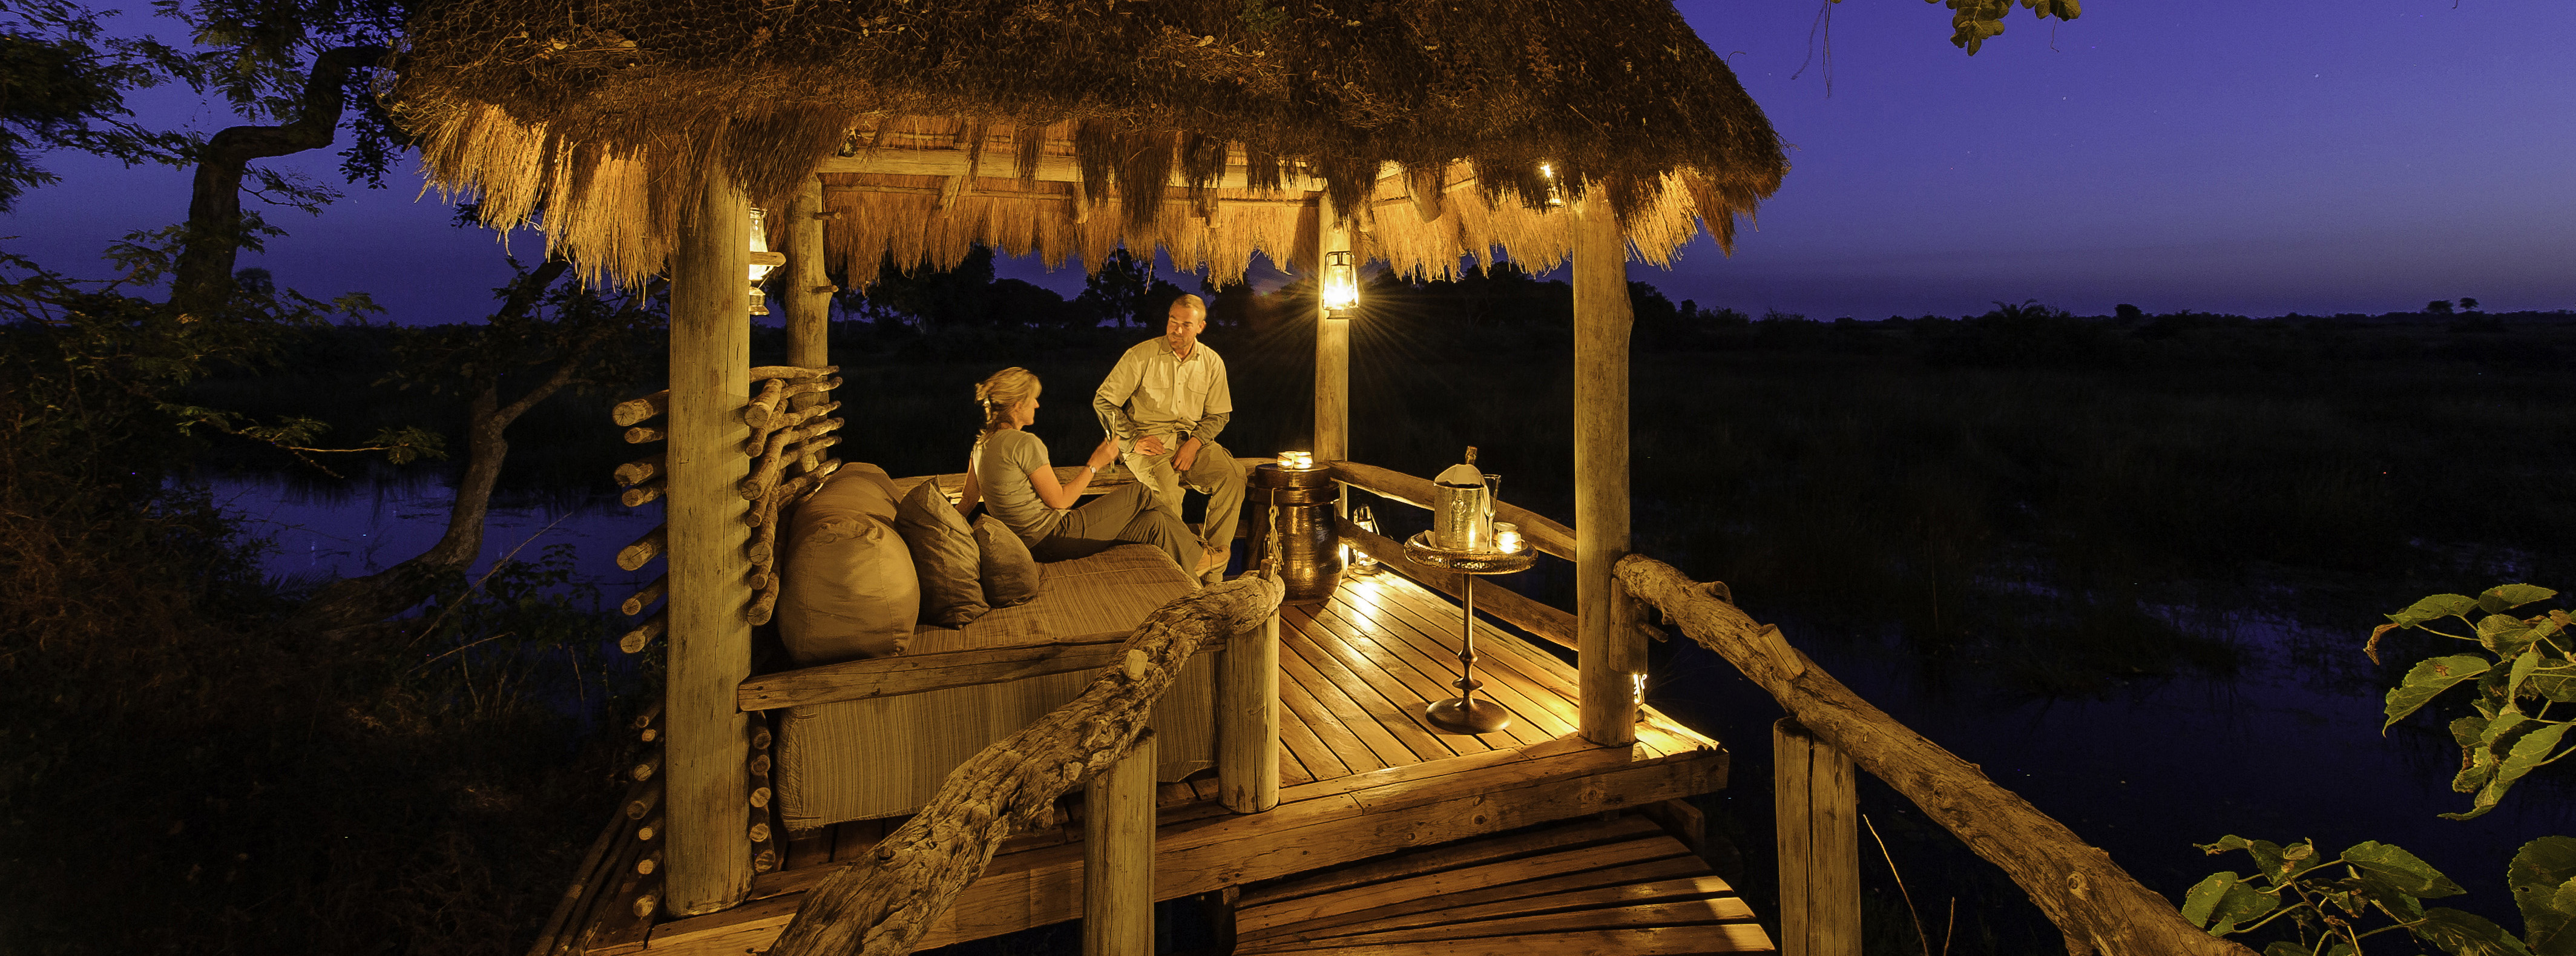 mombo-camp-okavango-delta-safari